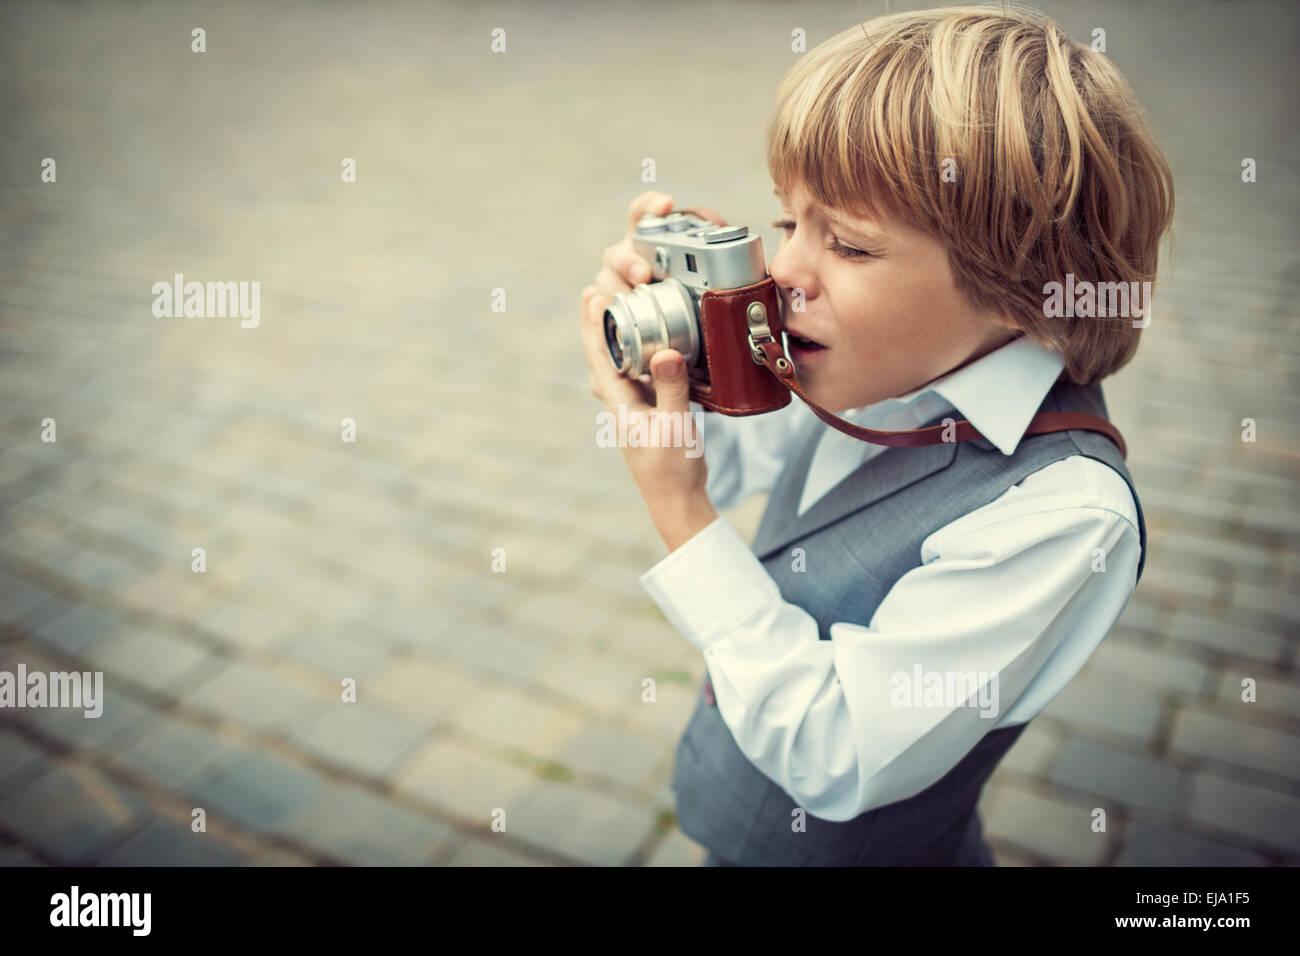 Hobbies - Stock Image